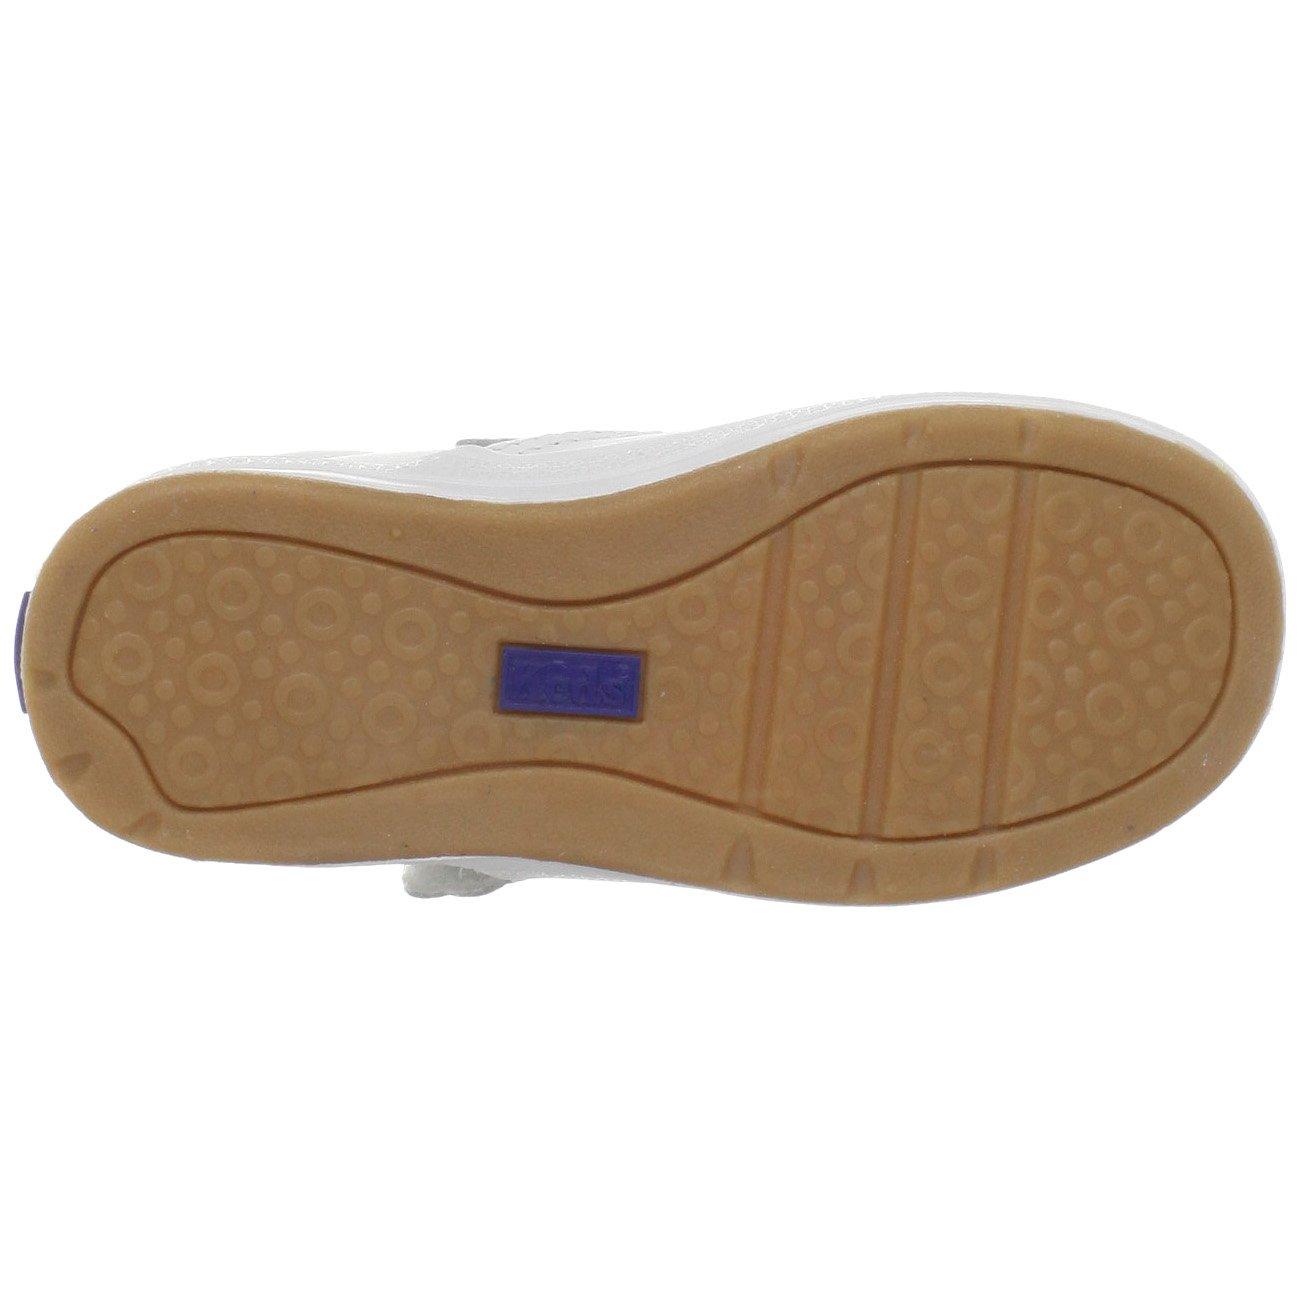 Keds Daphne T-Strap Sneaker (Toddler/Little Kid), White, 12 M US Little Kid by Keds (Image #3)